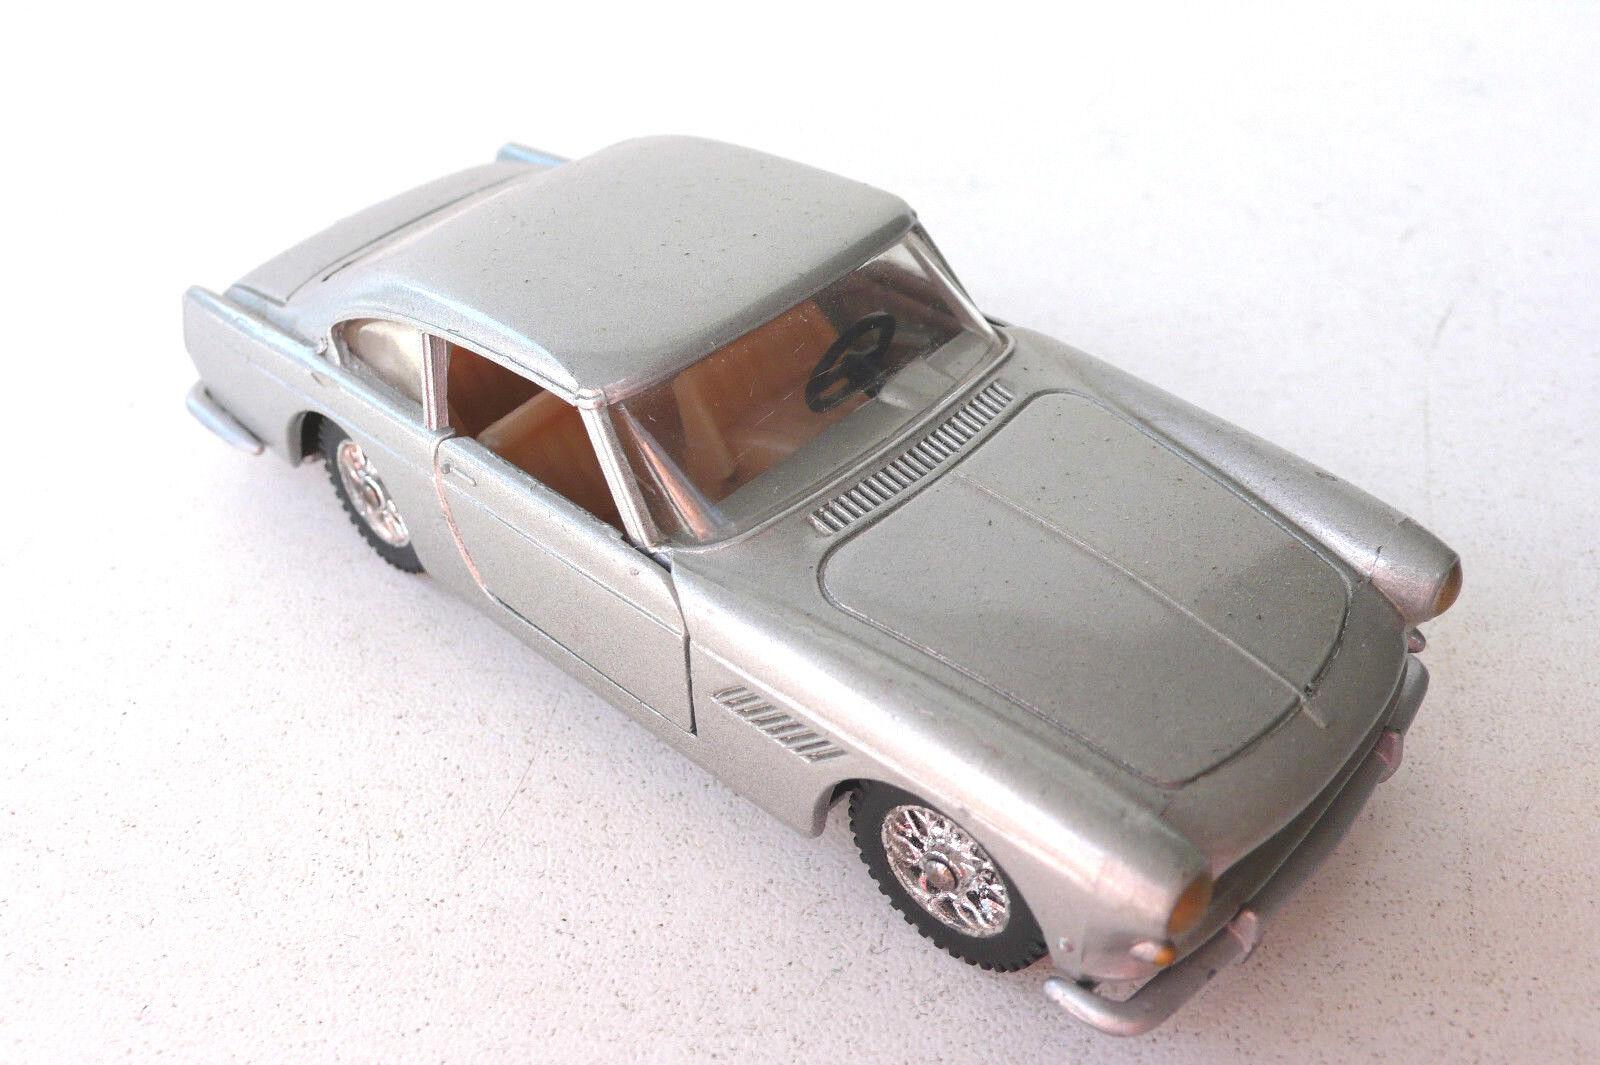 Solido i 43è ferrari 250 gt 2+2 1962  series 100 very good condition ref 123 nº 2  magasin d'usine